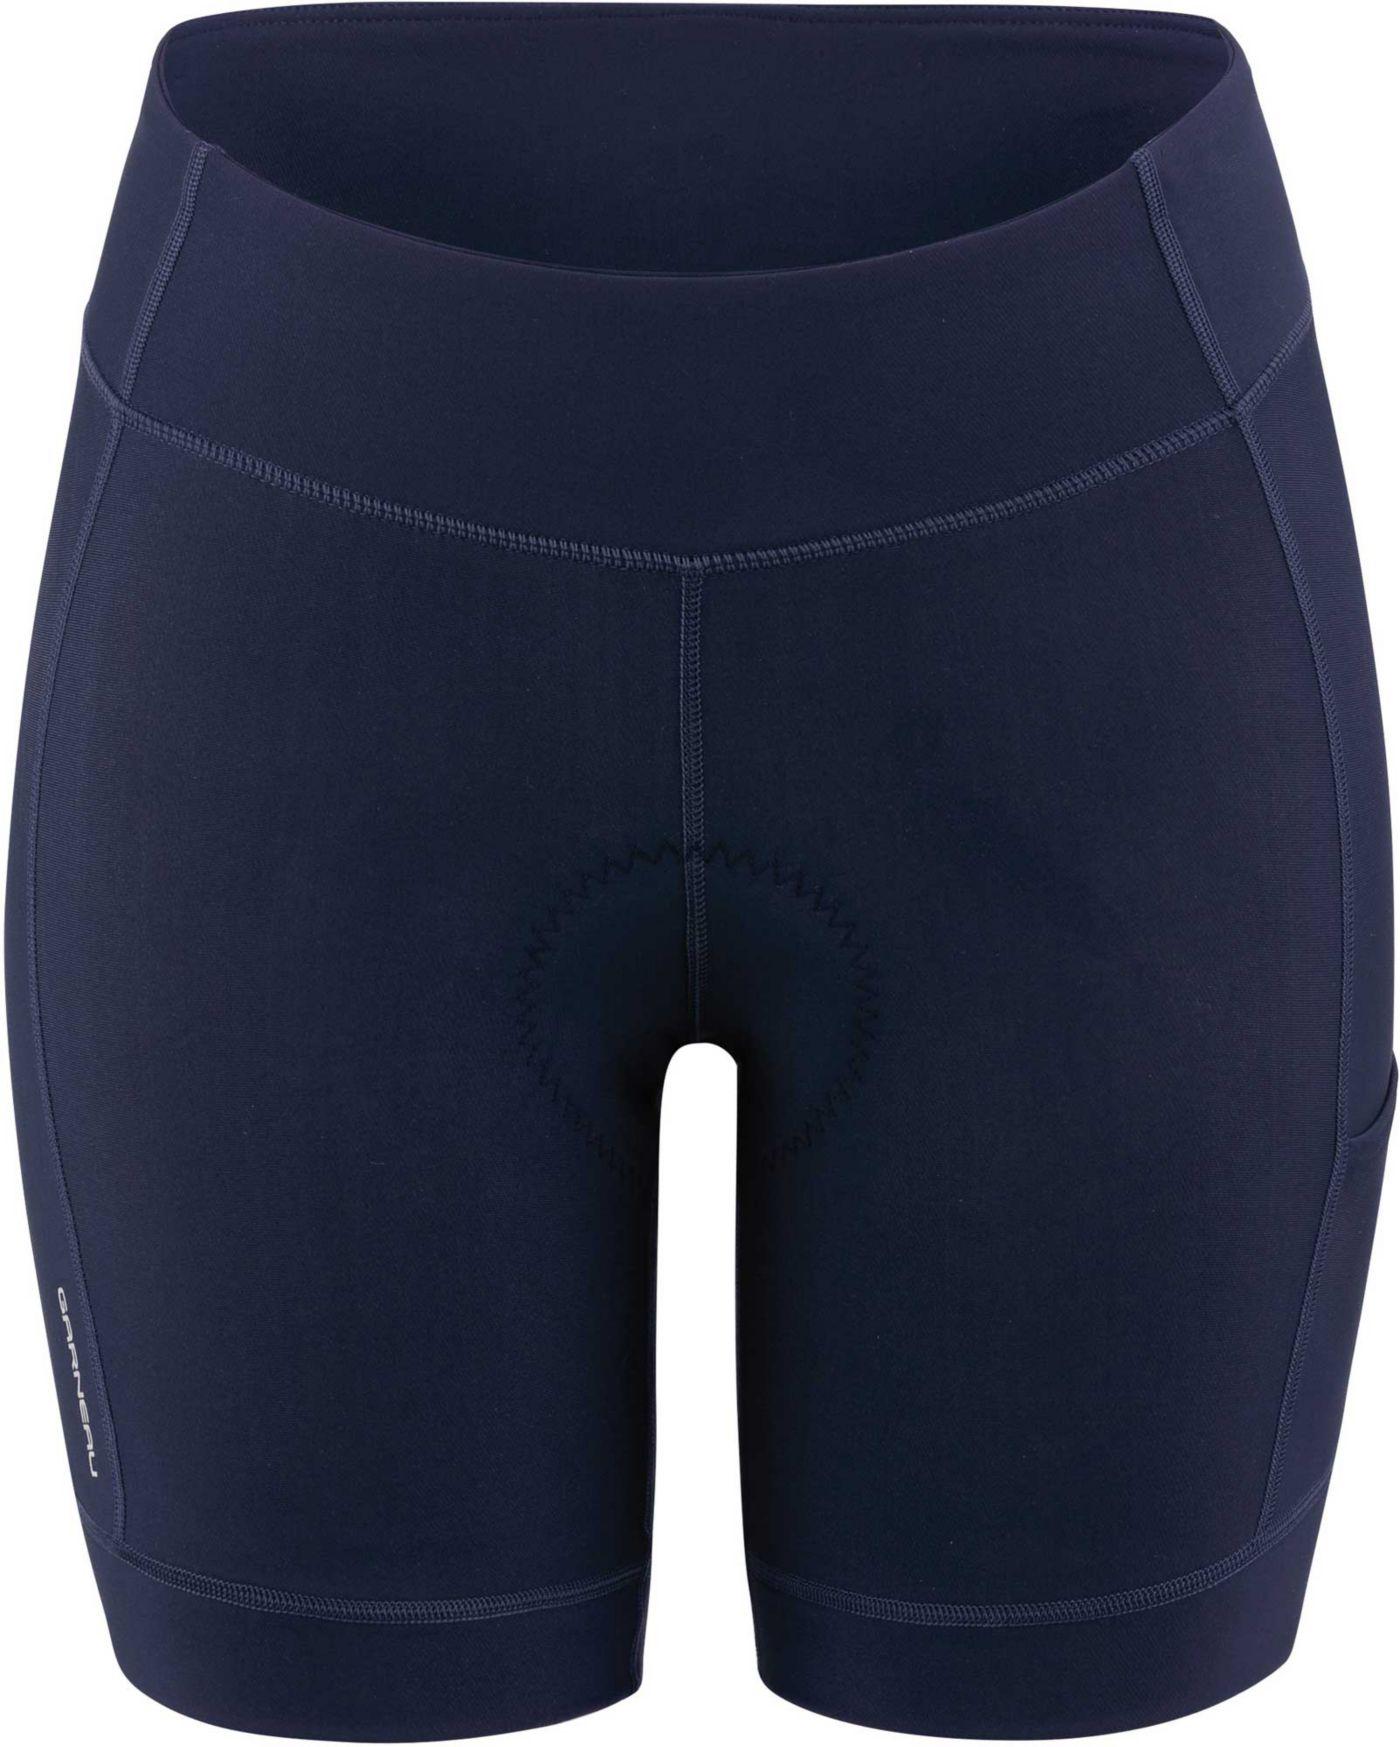 Garneau Women's Fit Sensor 7.5 Shorts 2